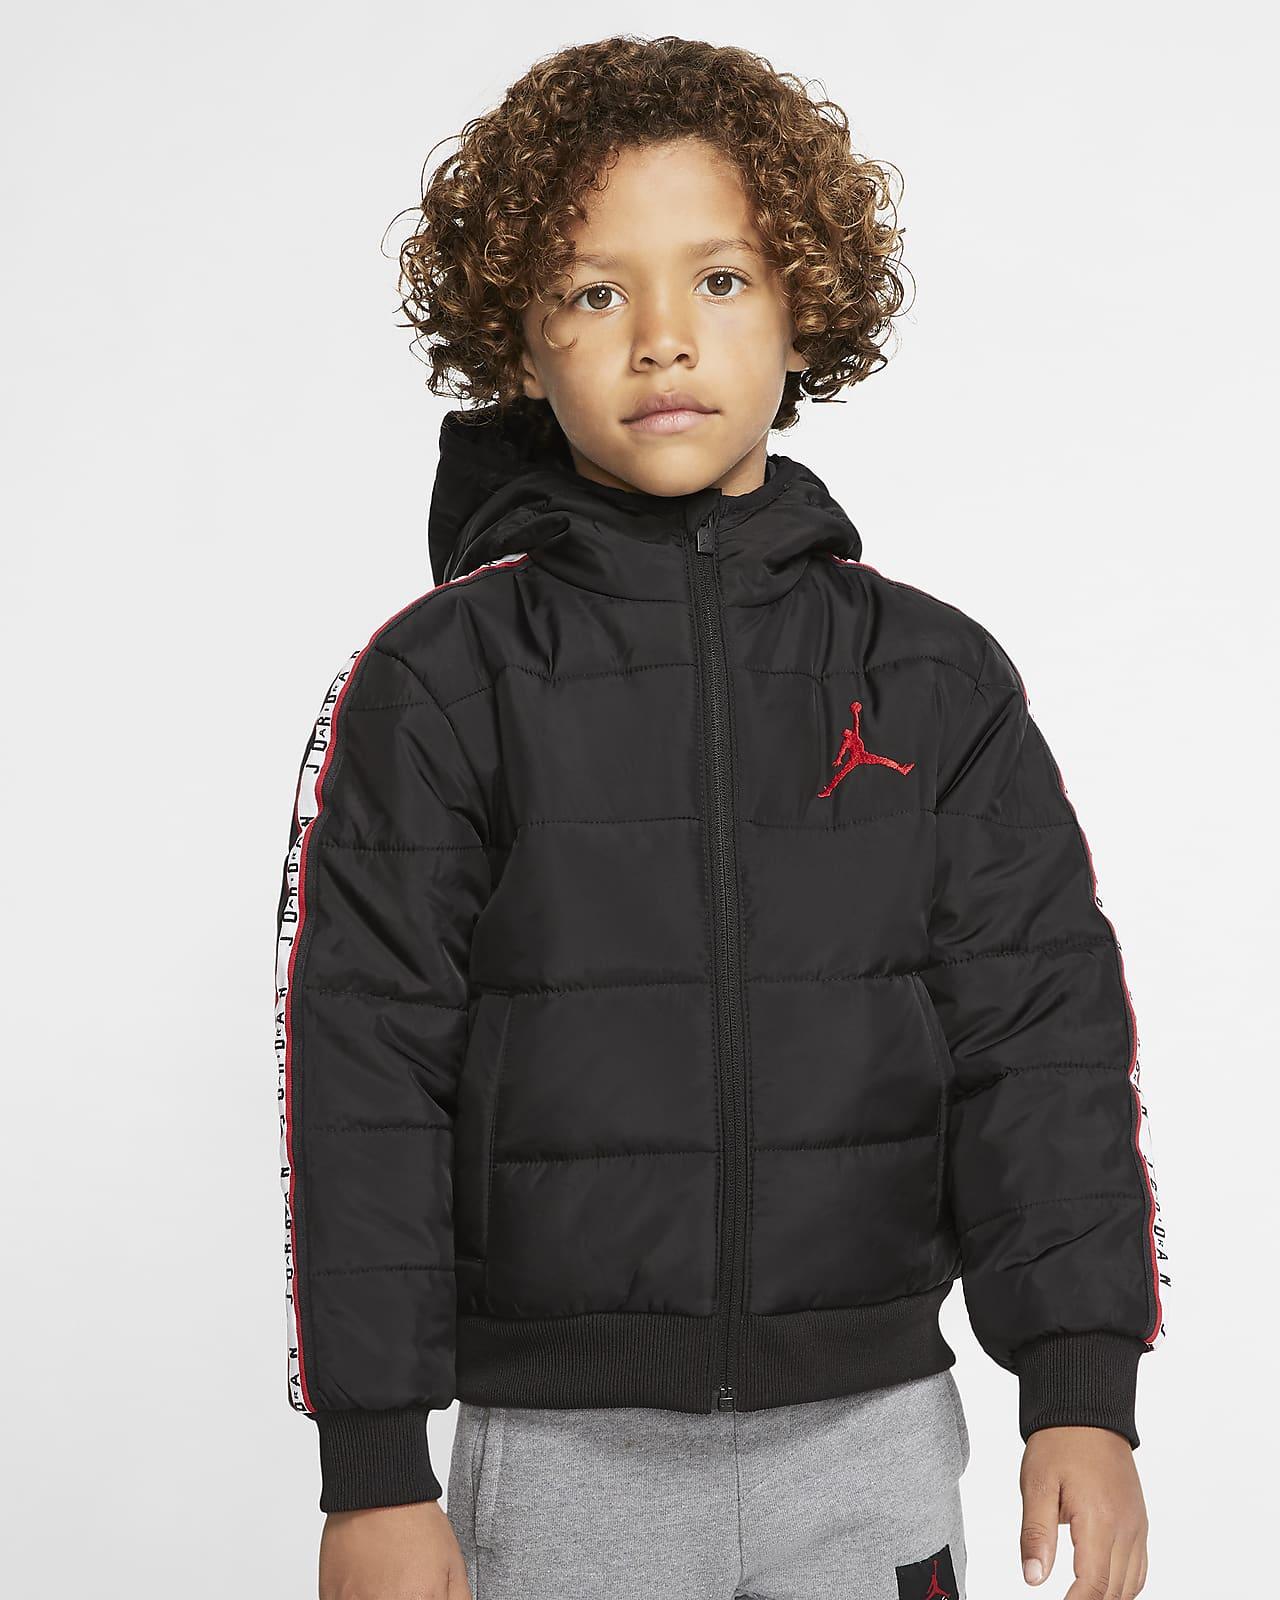 Jordan Jumpman Younger Kids' Taped Puffer Jacket